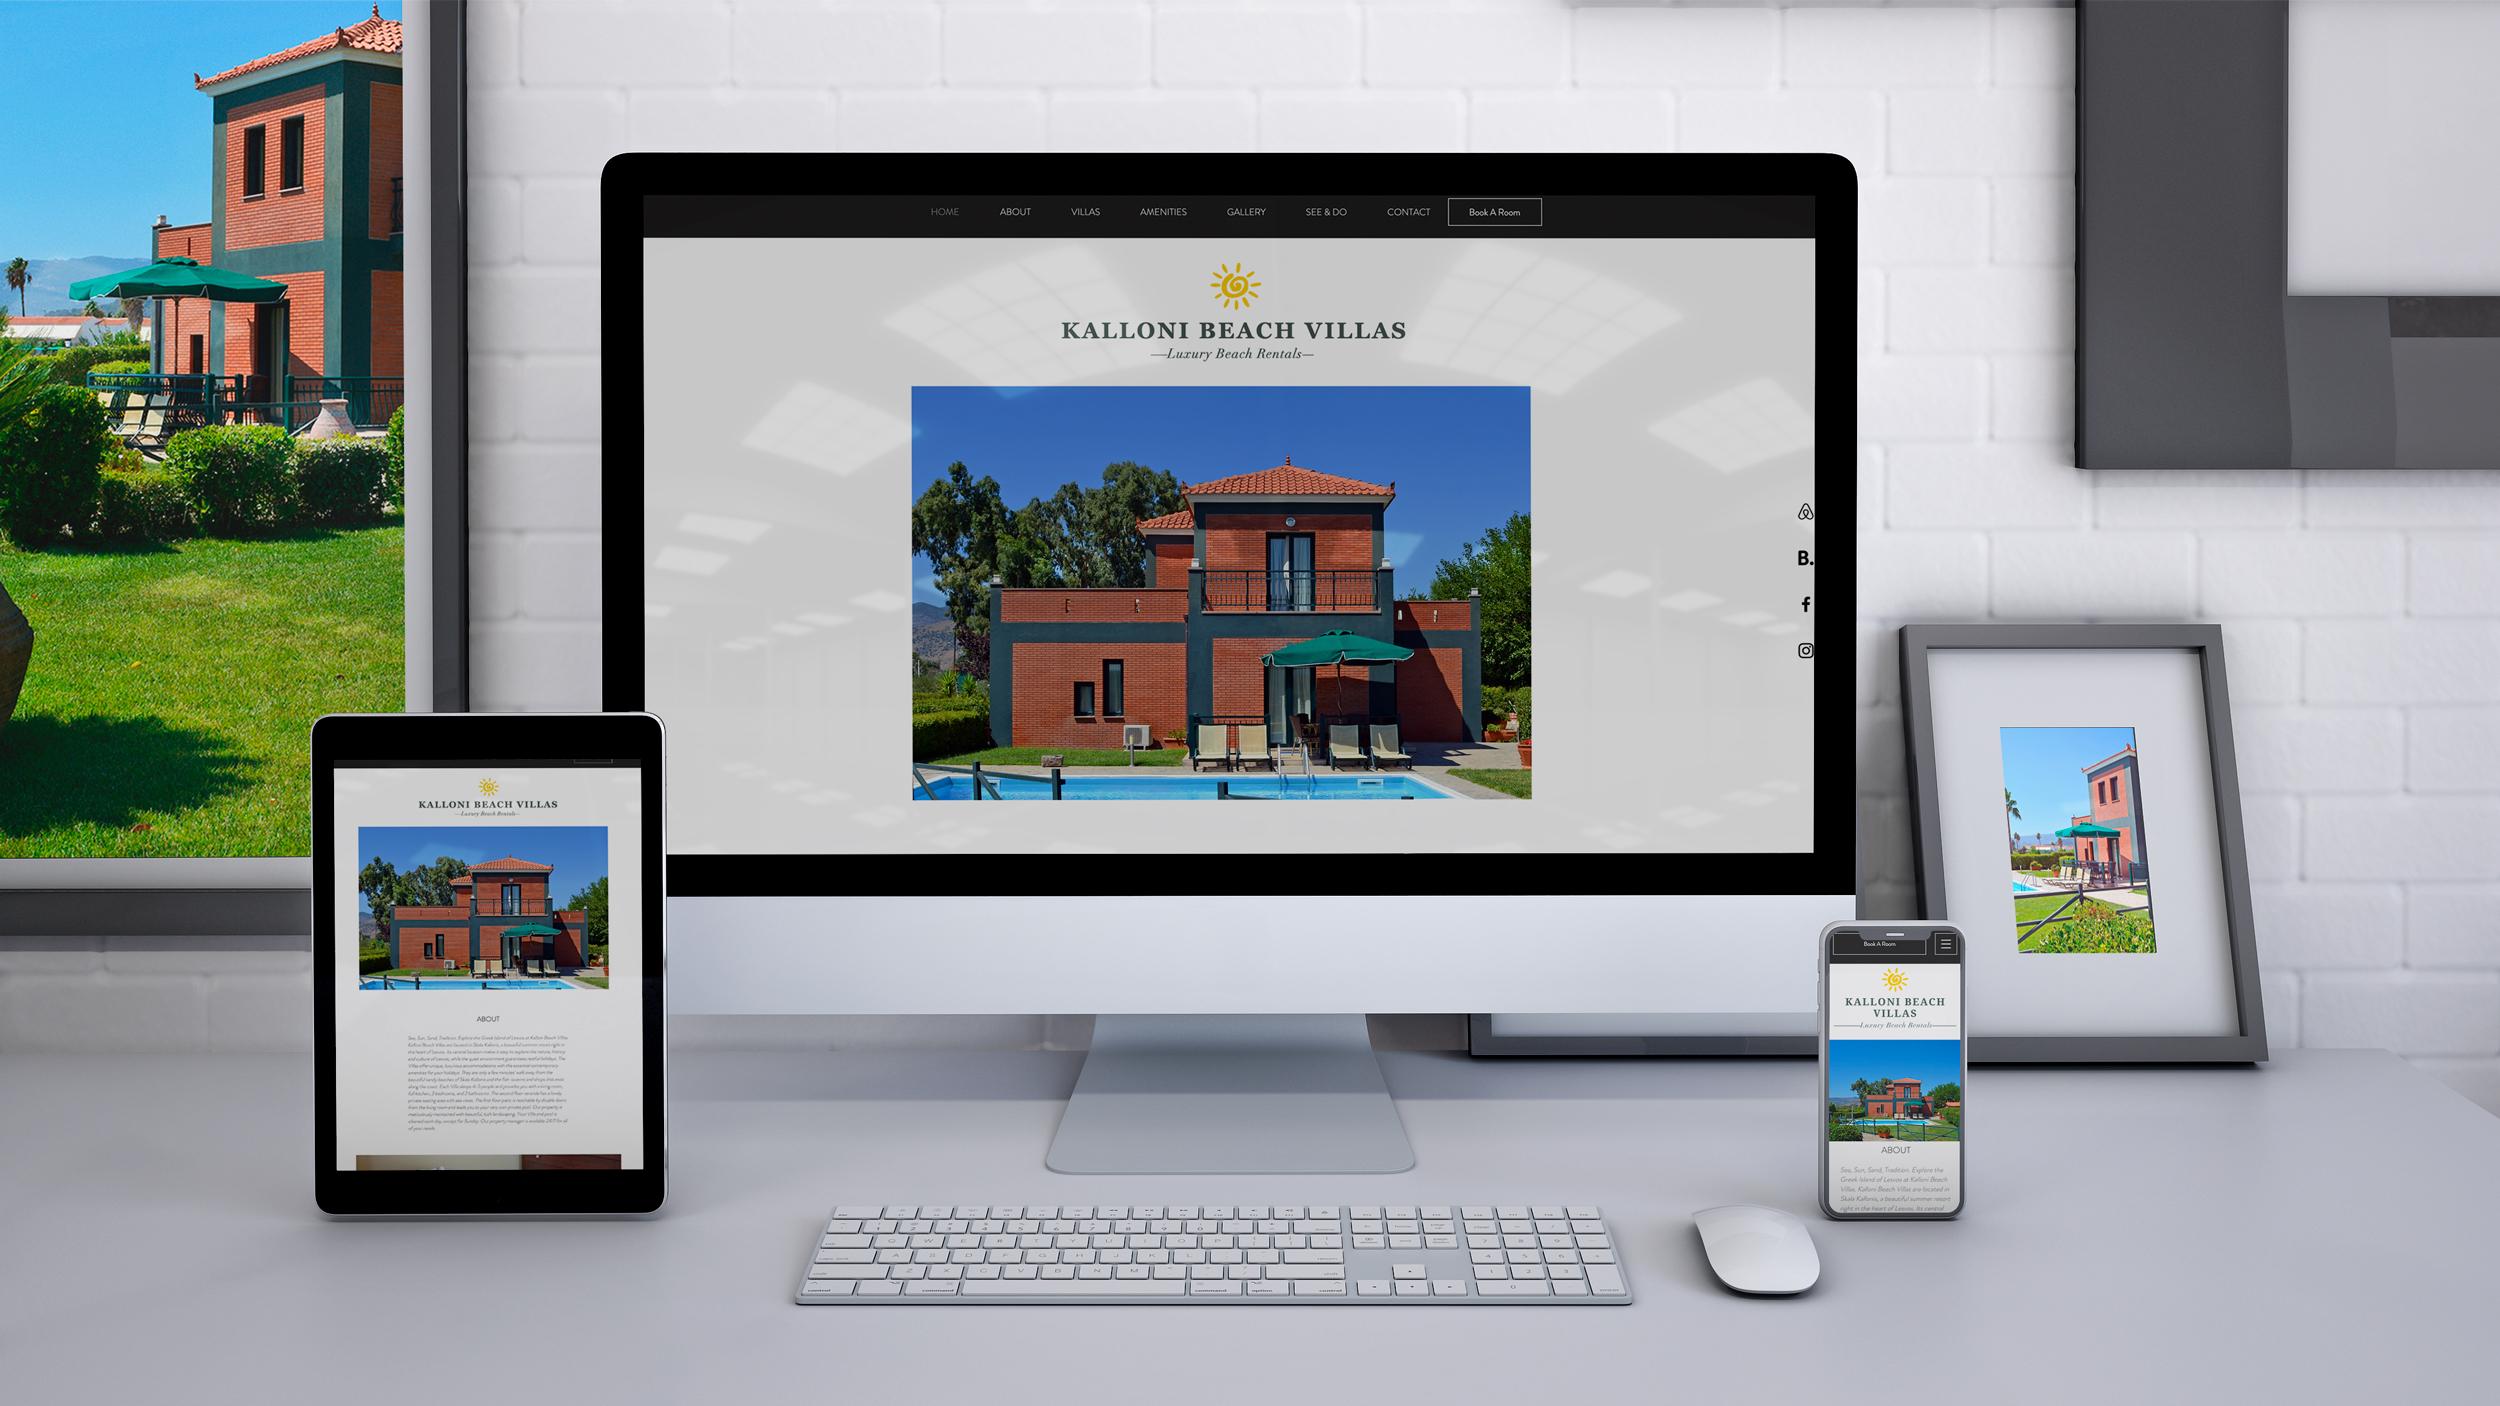 Kalloni Beach Villas